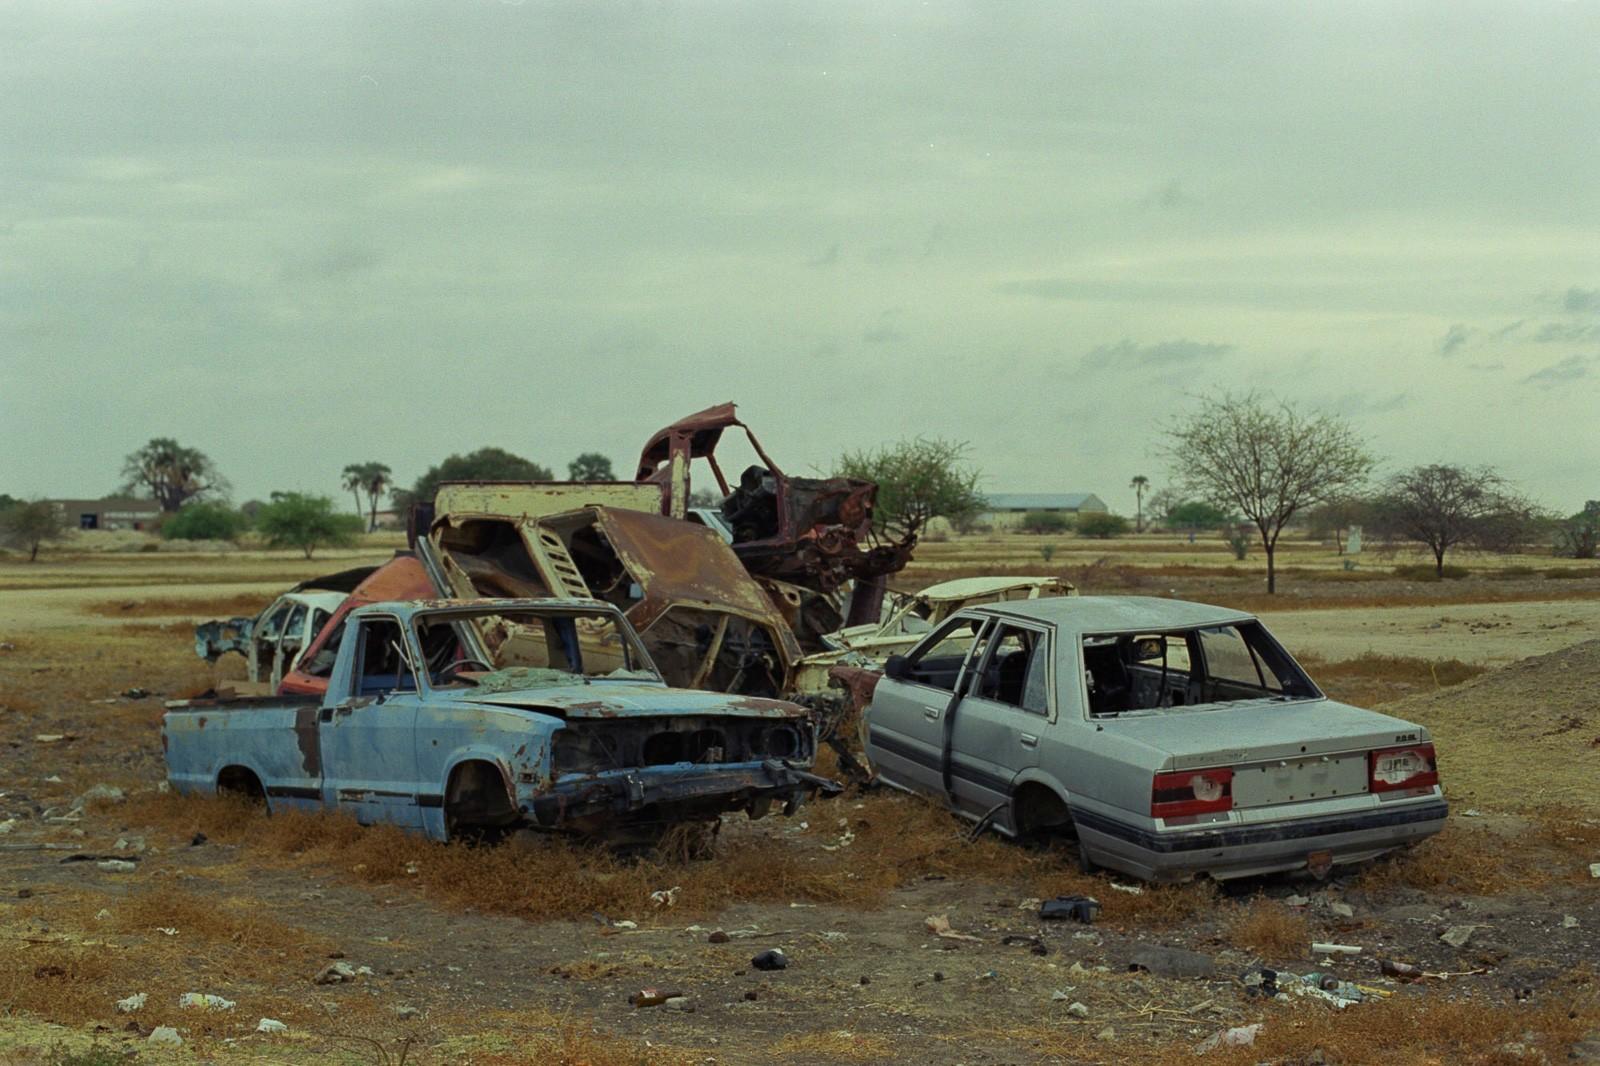 namibia-desolation-05.jpg